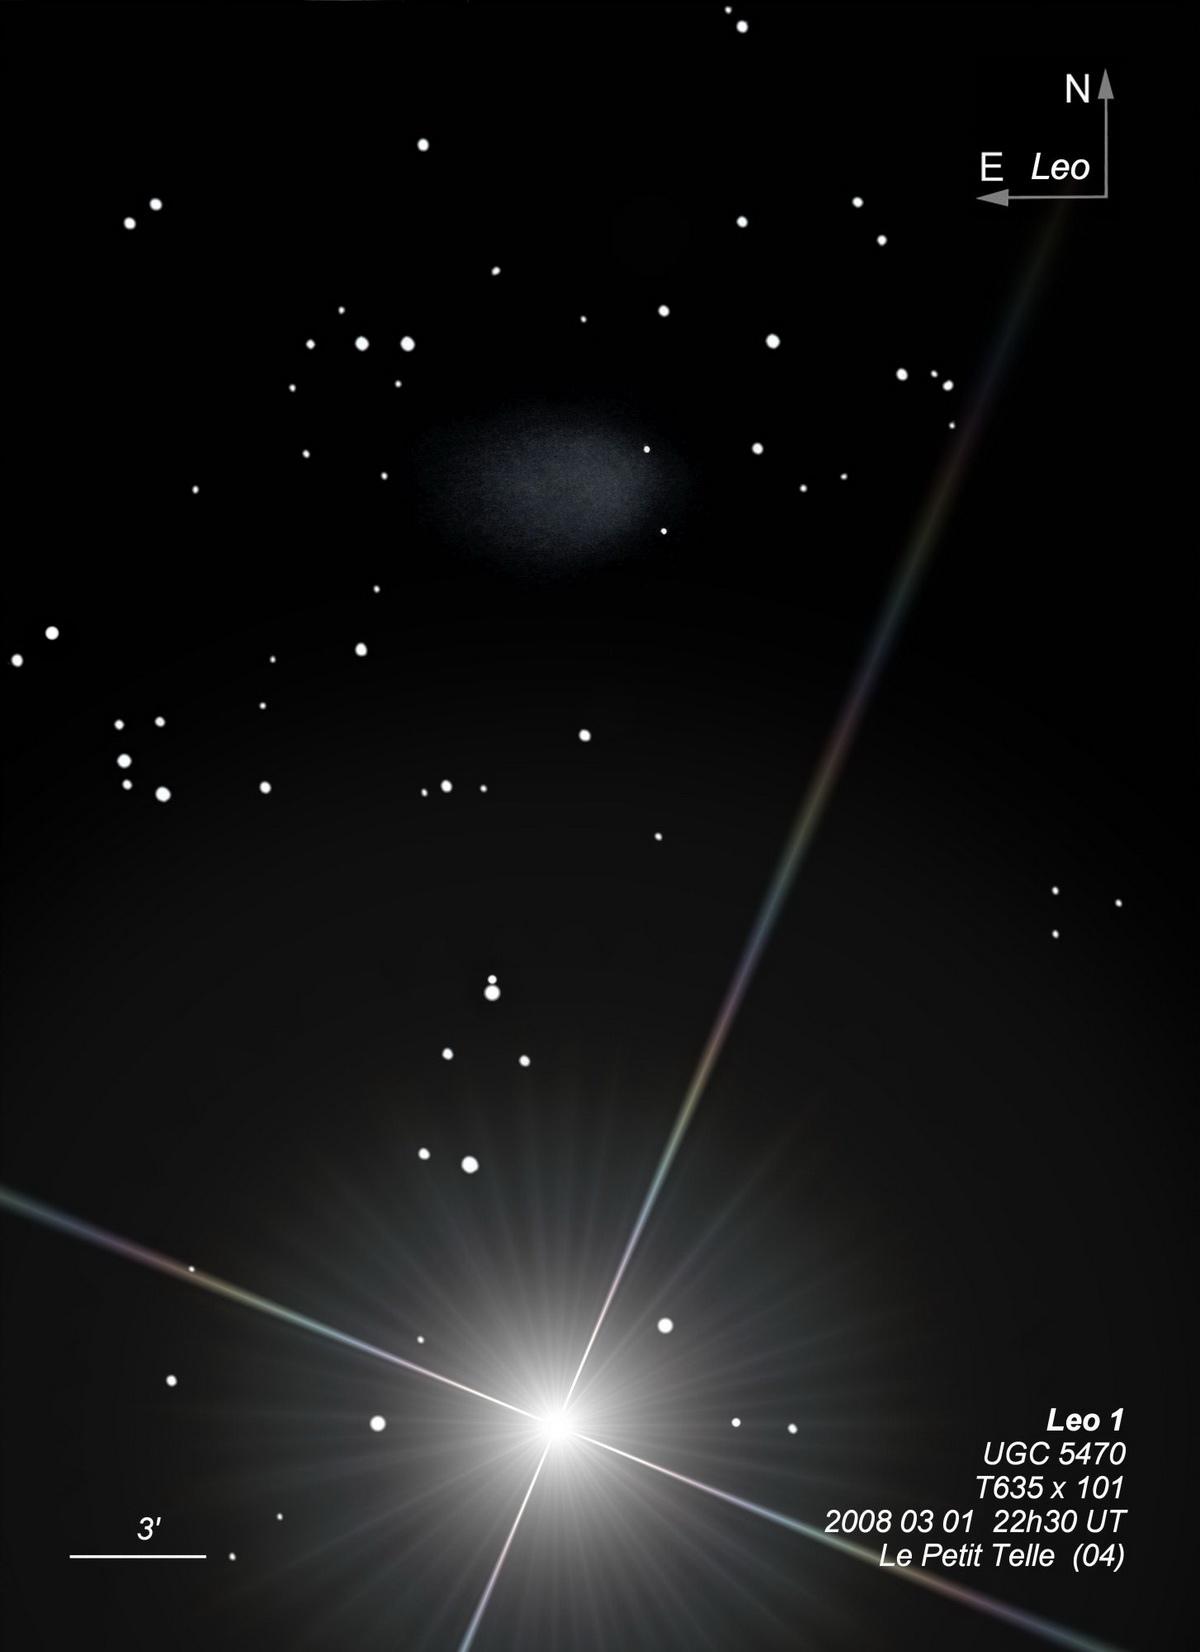 UGC 5470  Leo 1  T635 BL.jpg